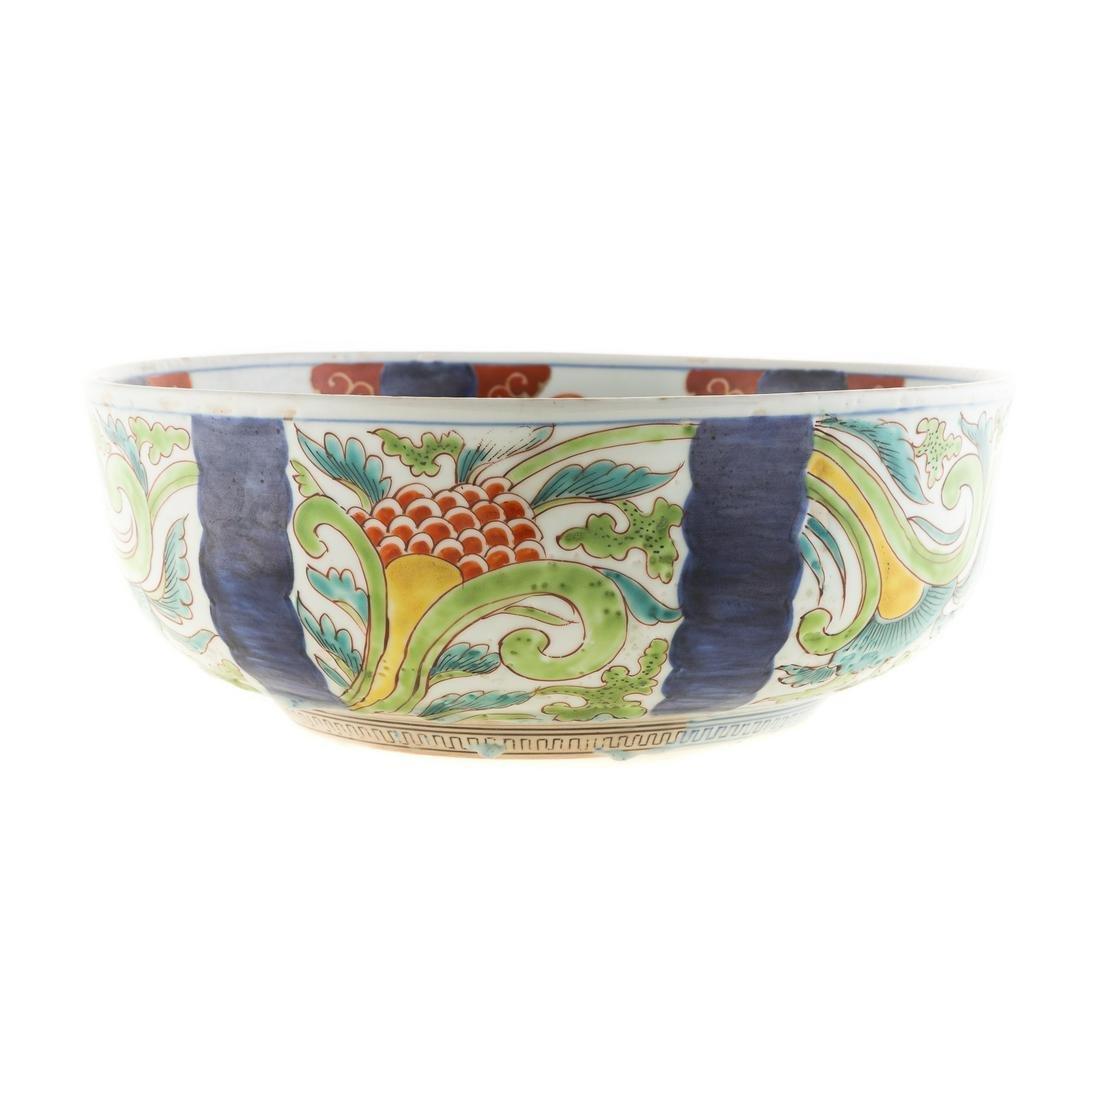 Japanese Imari Porcelain Bowl